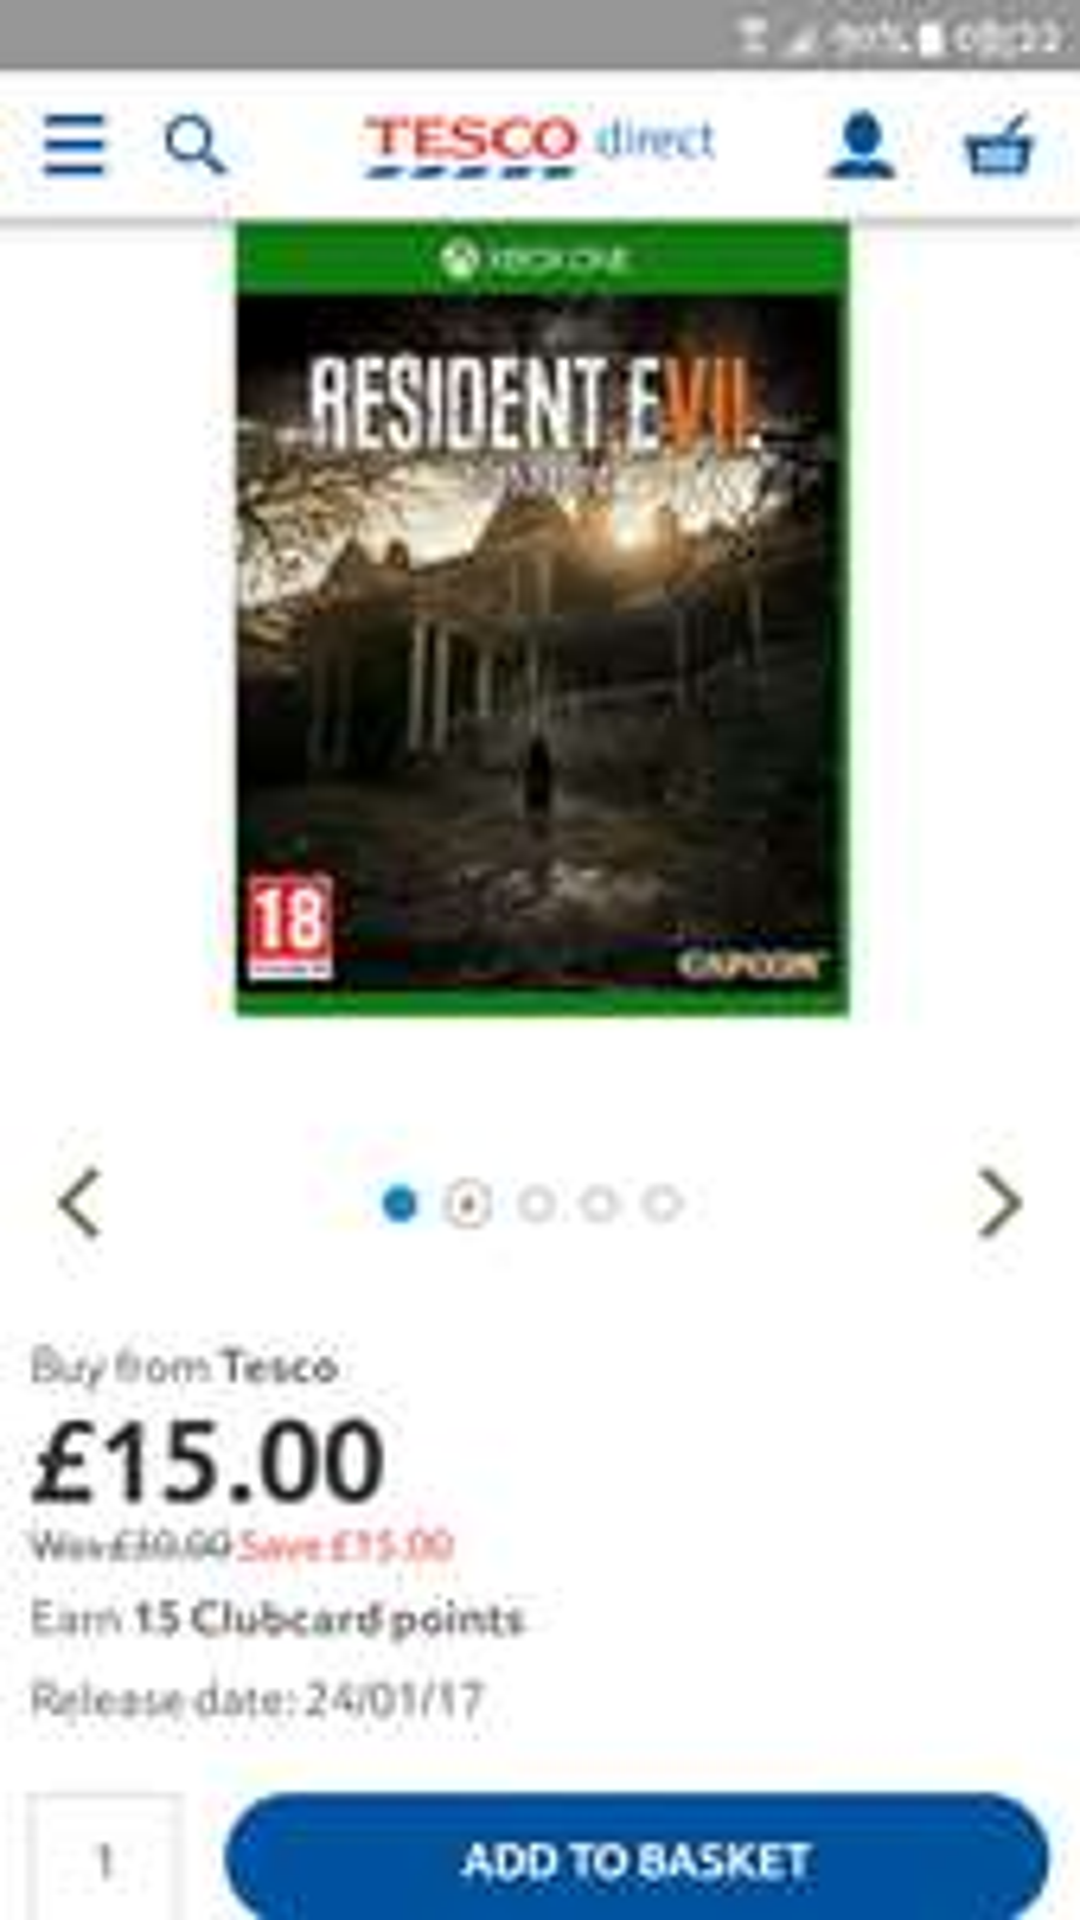 Resident Evil 7 Biohazard £15 Tesco Direct BACK IN STOCK